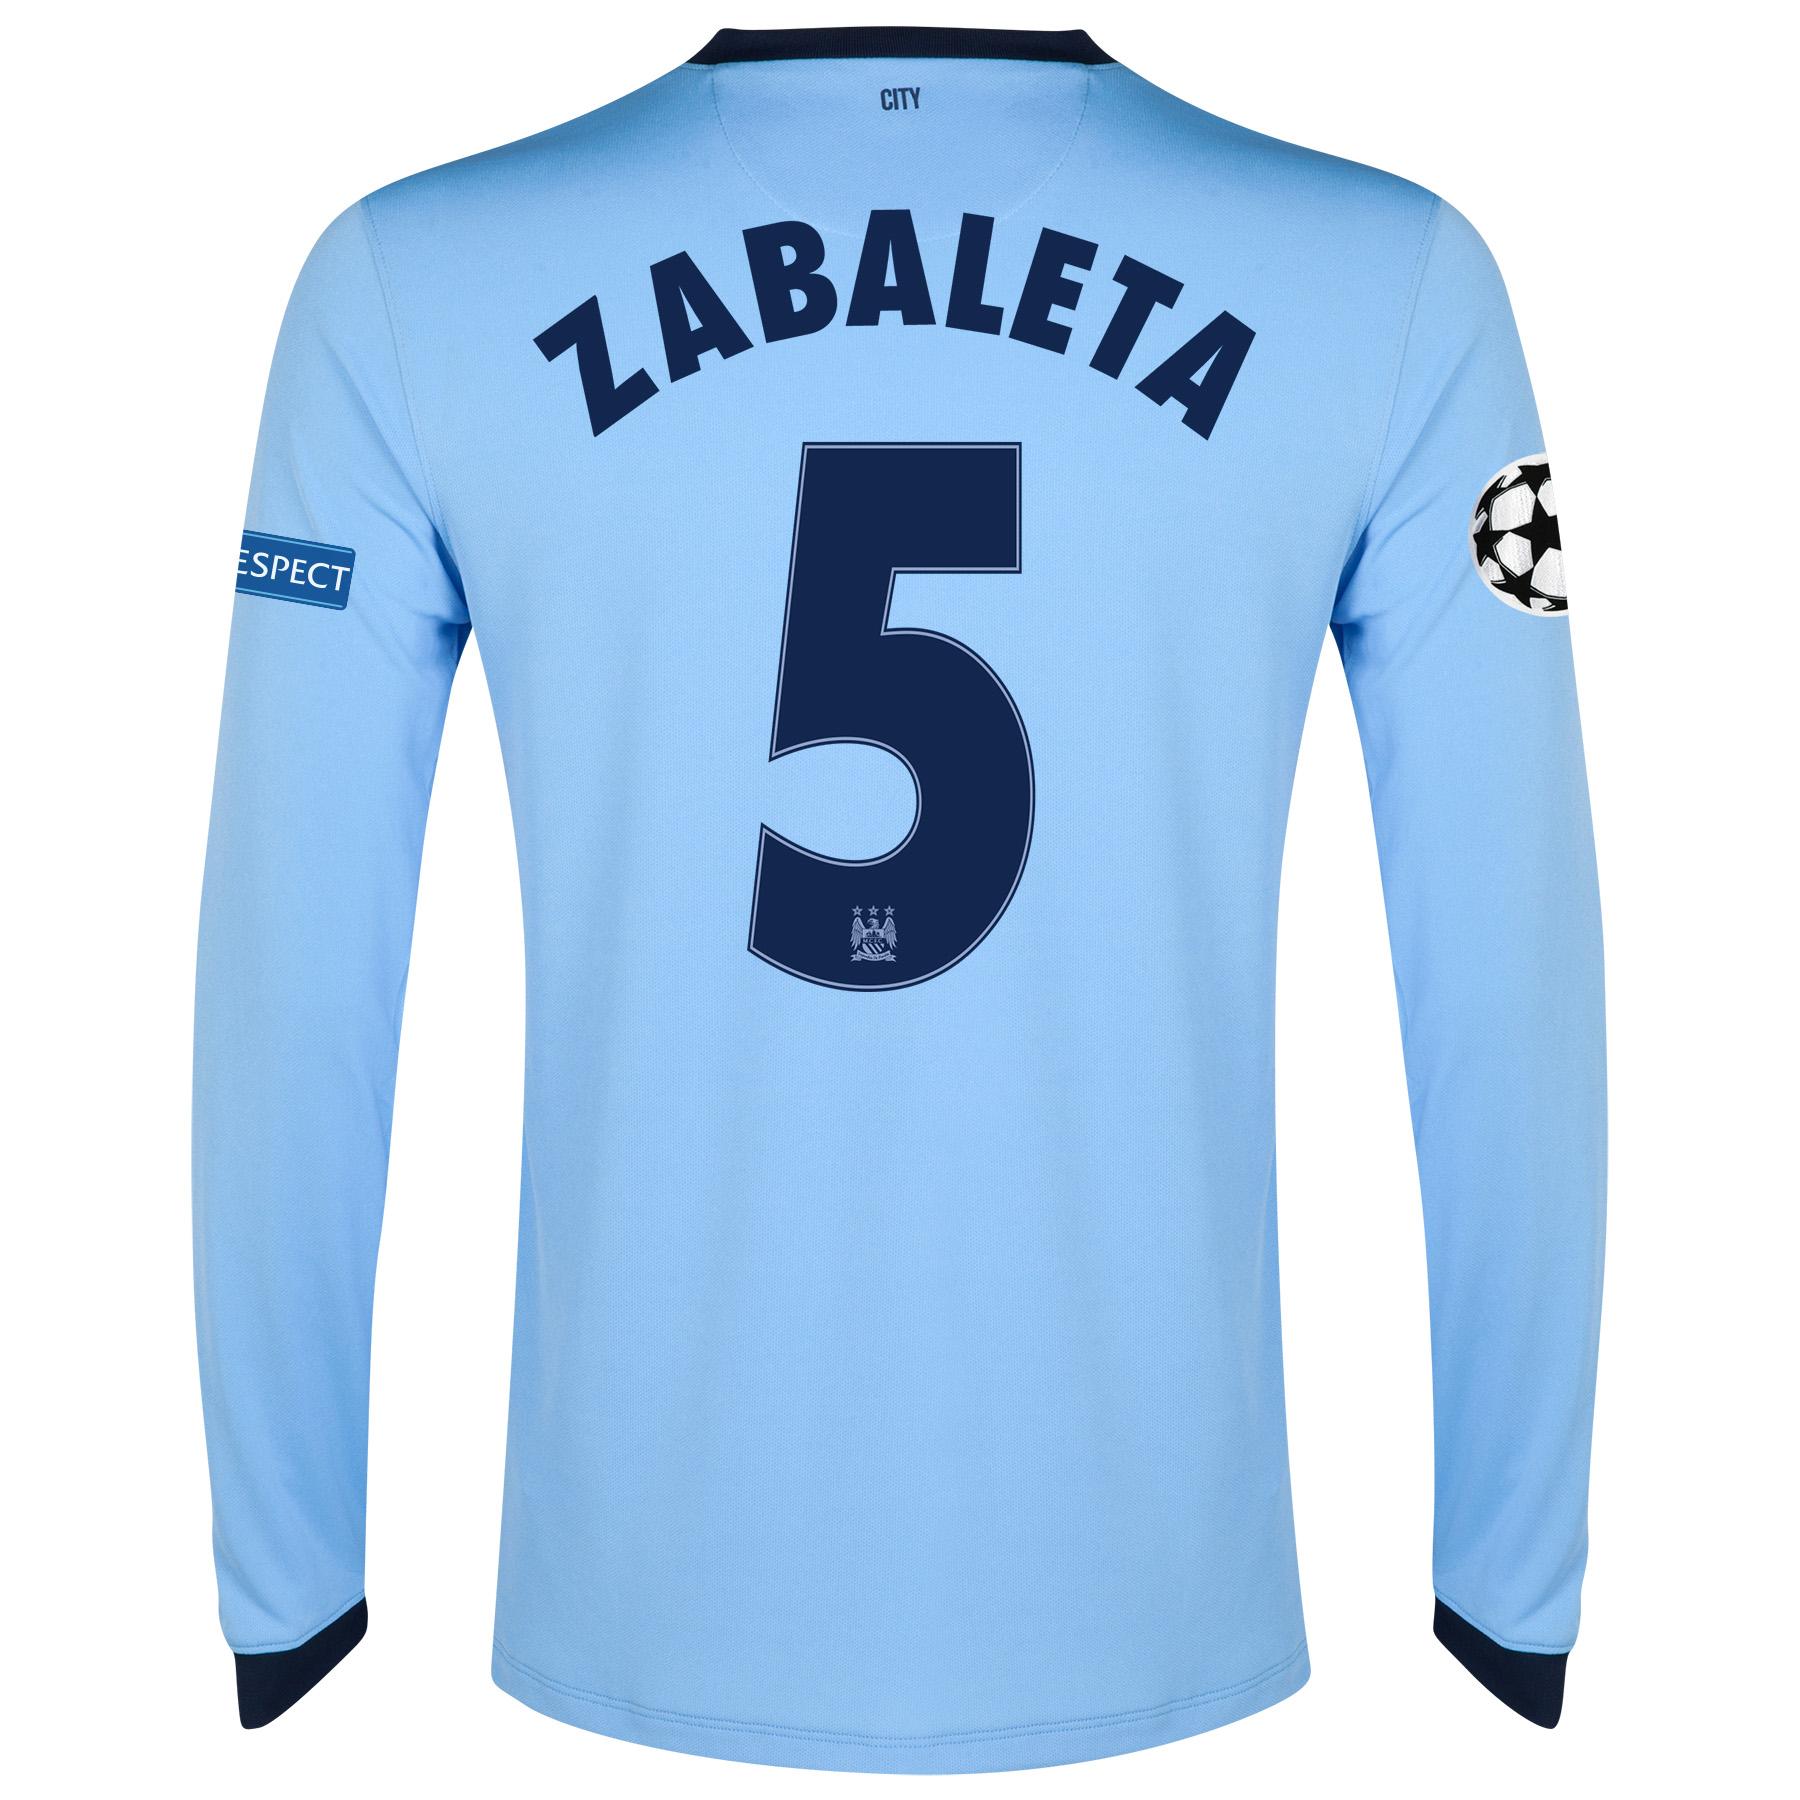 Manchester City UEFA Champions League Home Shirt 2014/15 - Long Sleeve - Kids Sky Blue with Zabaleta 5 printing